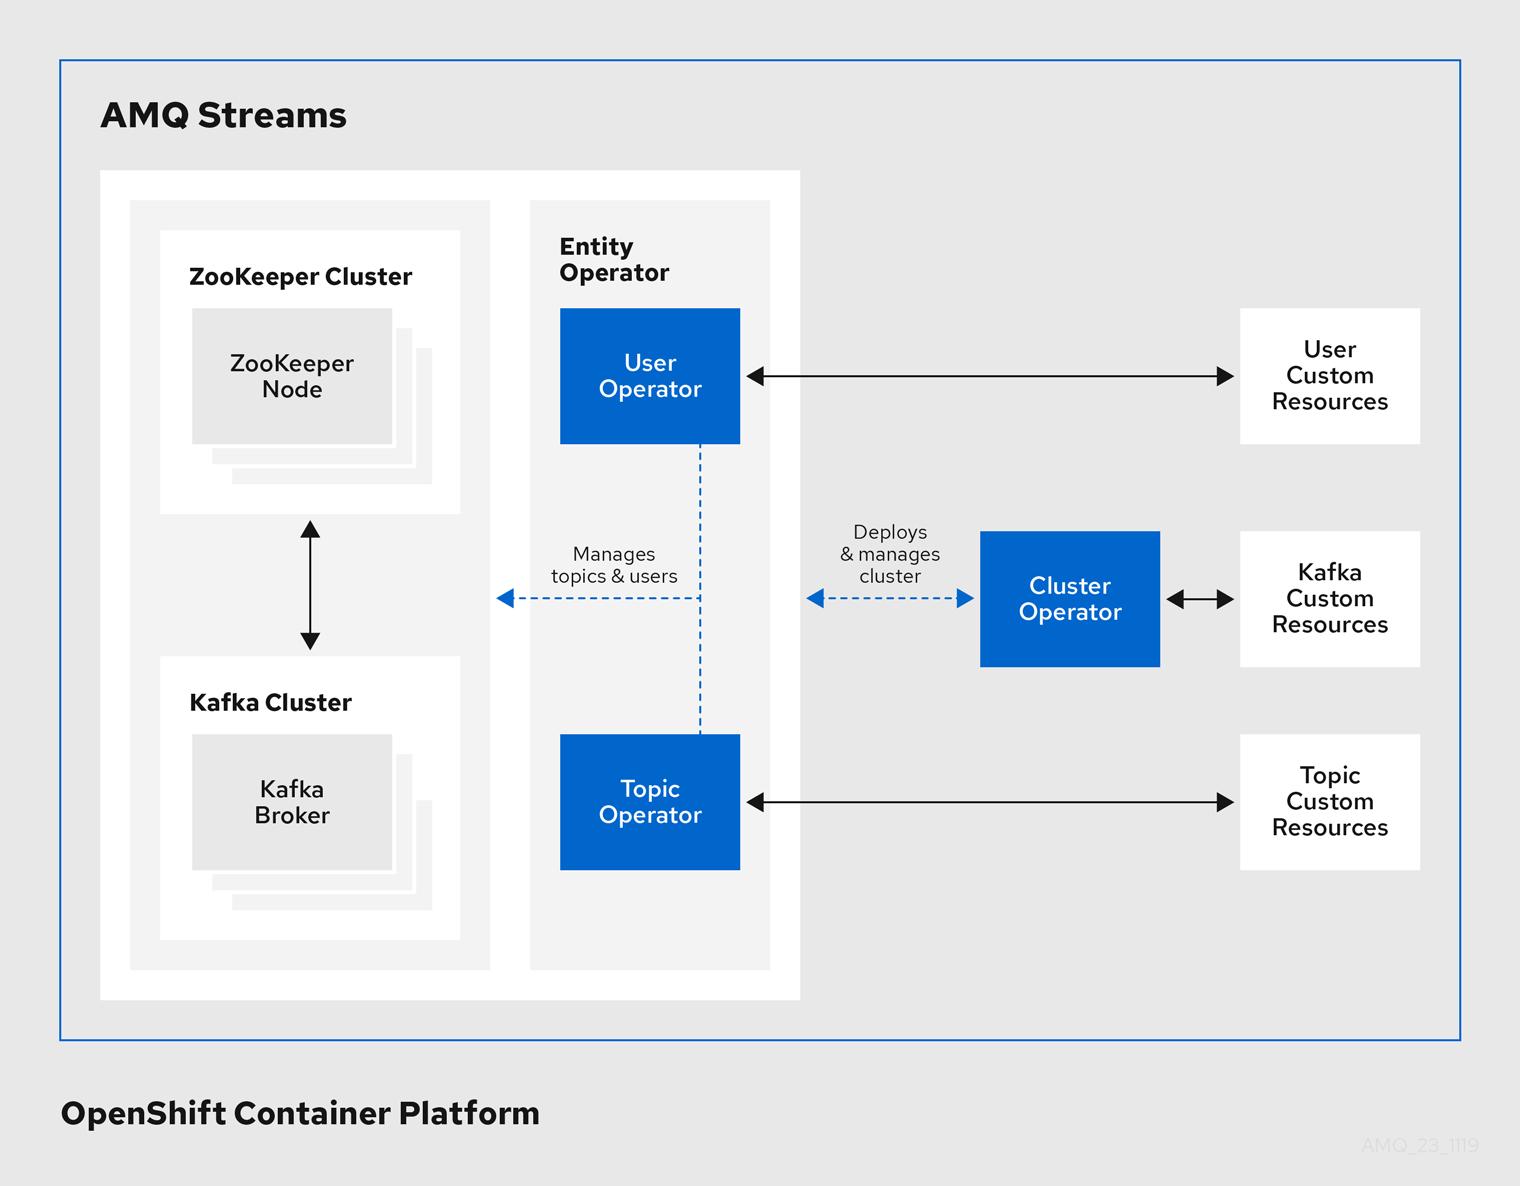 Operators within the AMQ Streams architecture